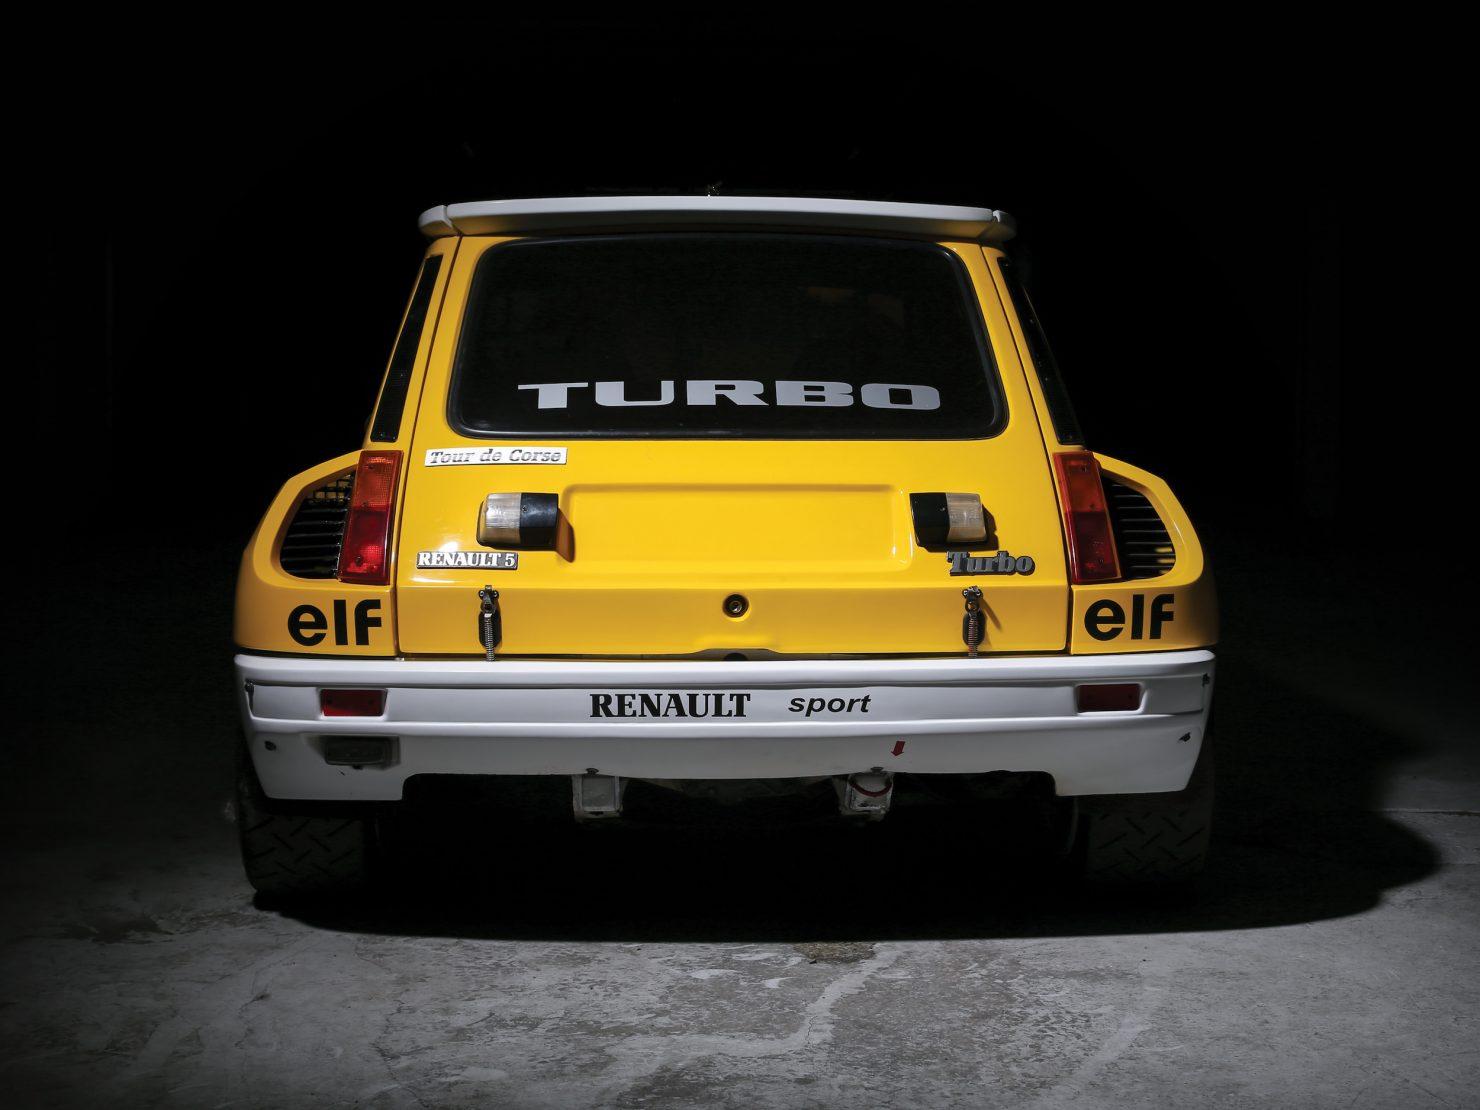 Renault 5 Turbo 7 1480x1110 - 1980 Renault 5 Turbo